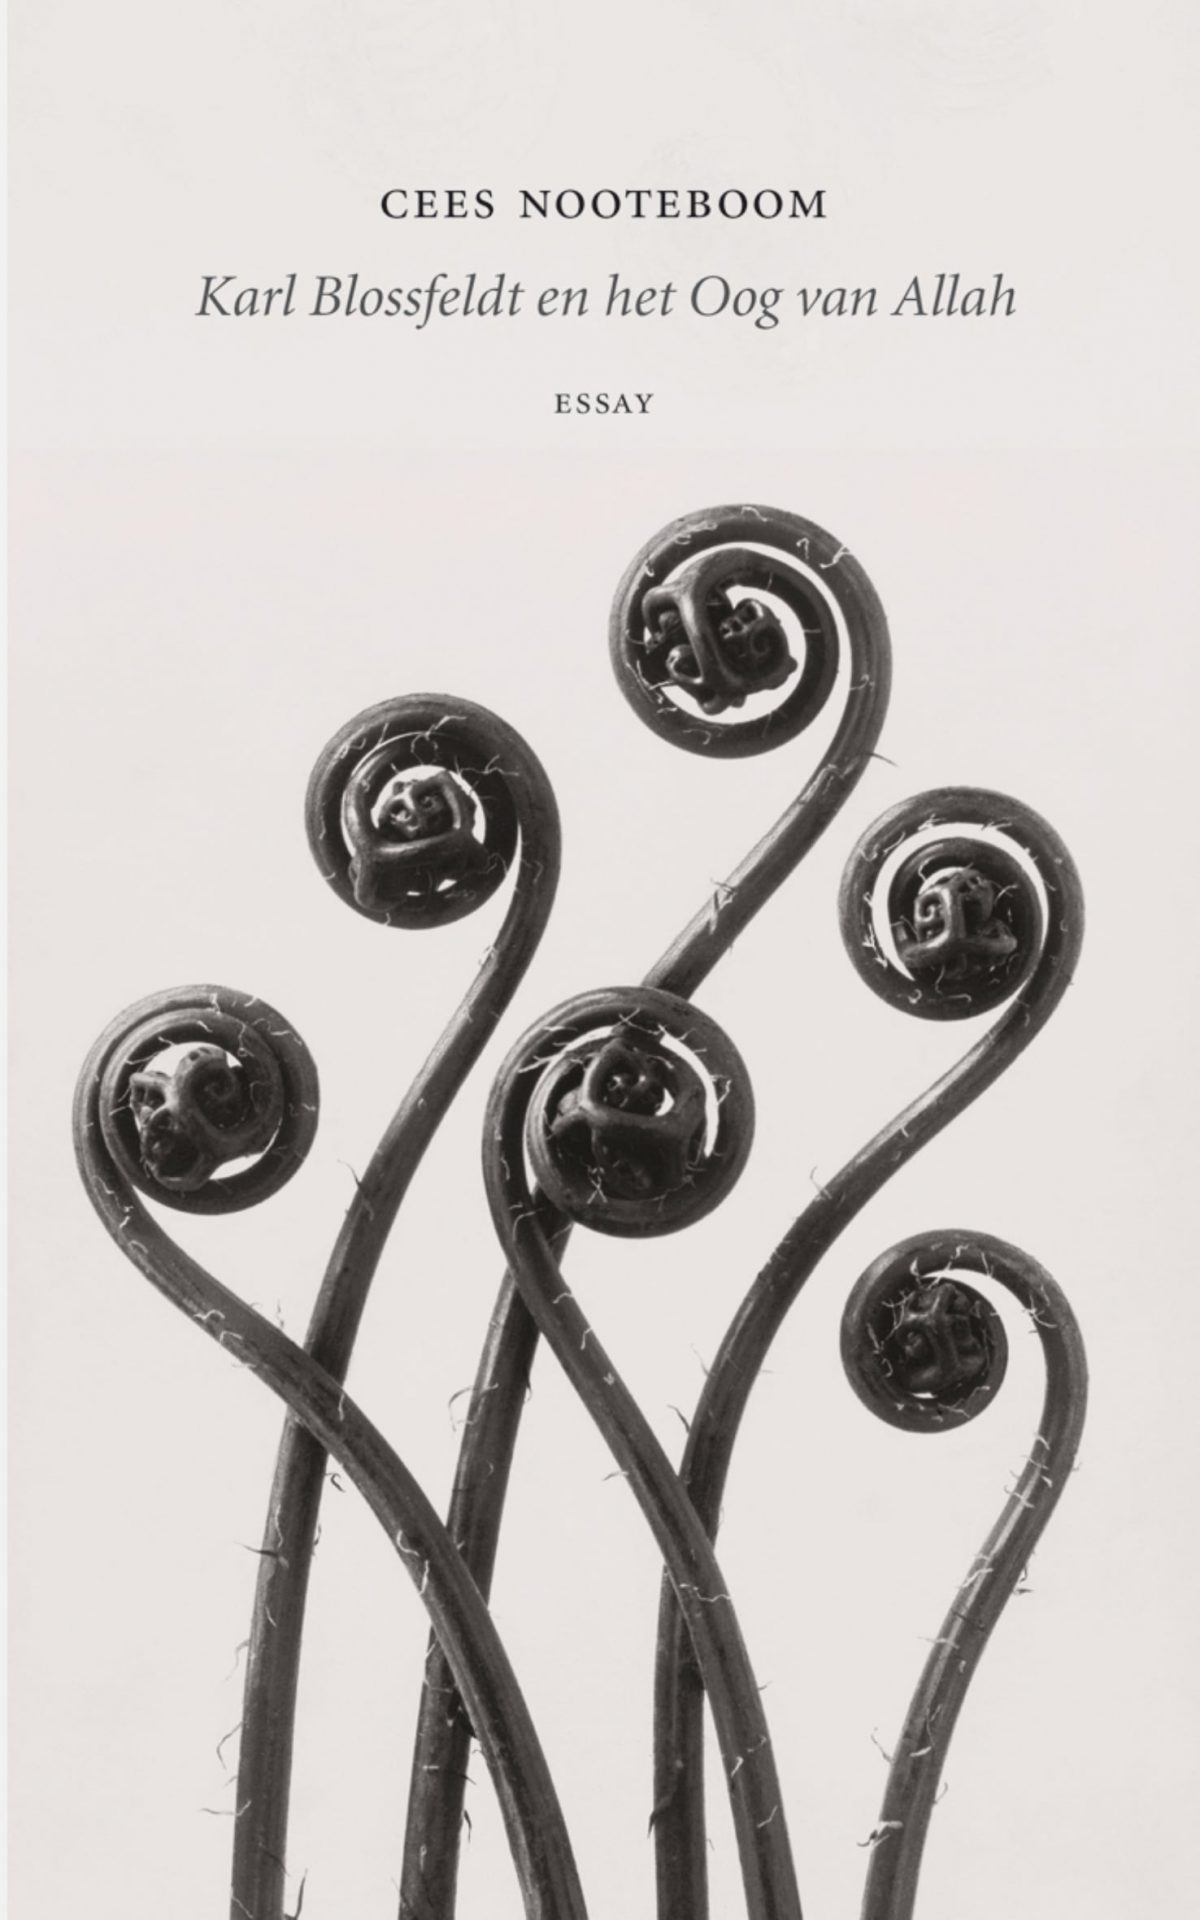 Karl Blossfeldt en het Oog van Allah - Ceea Nooteboom